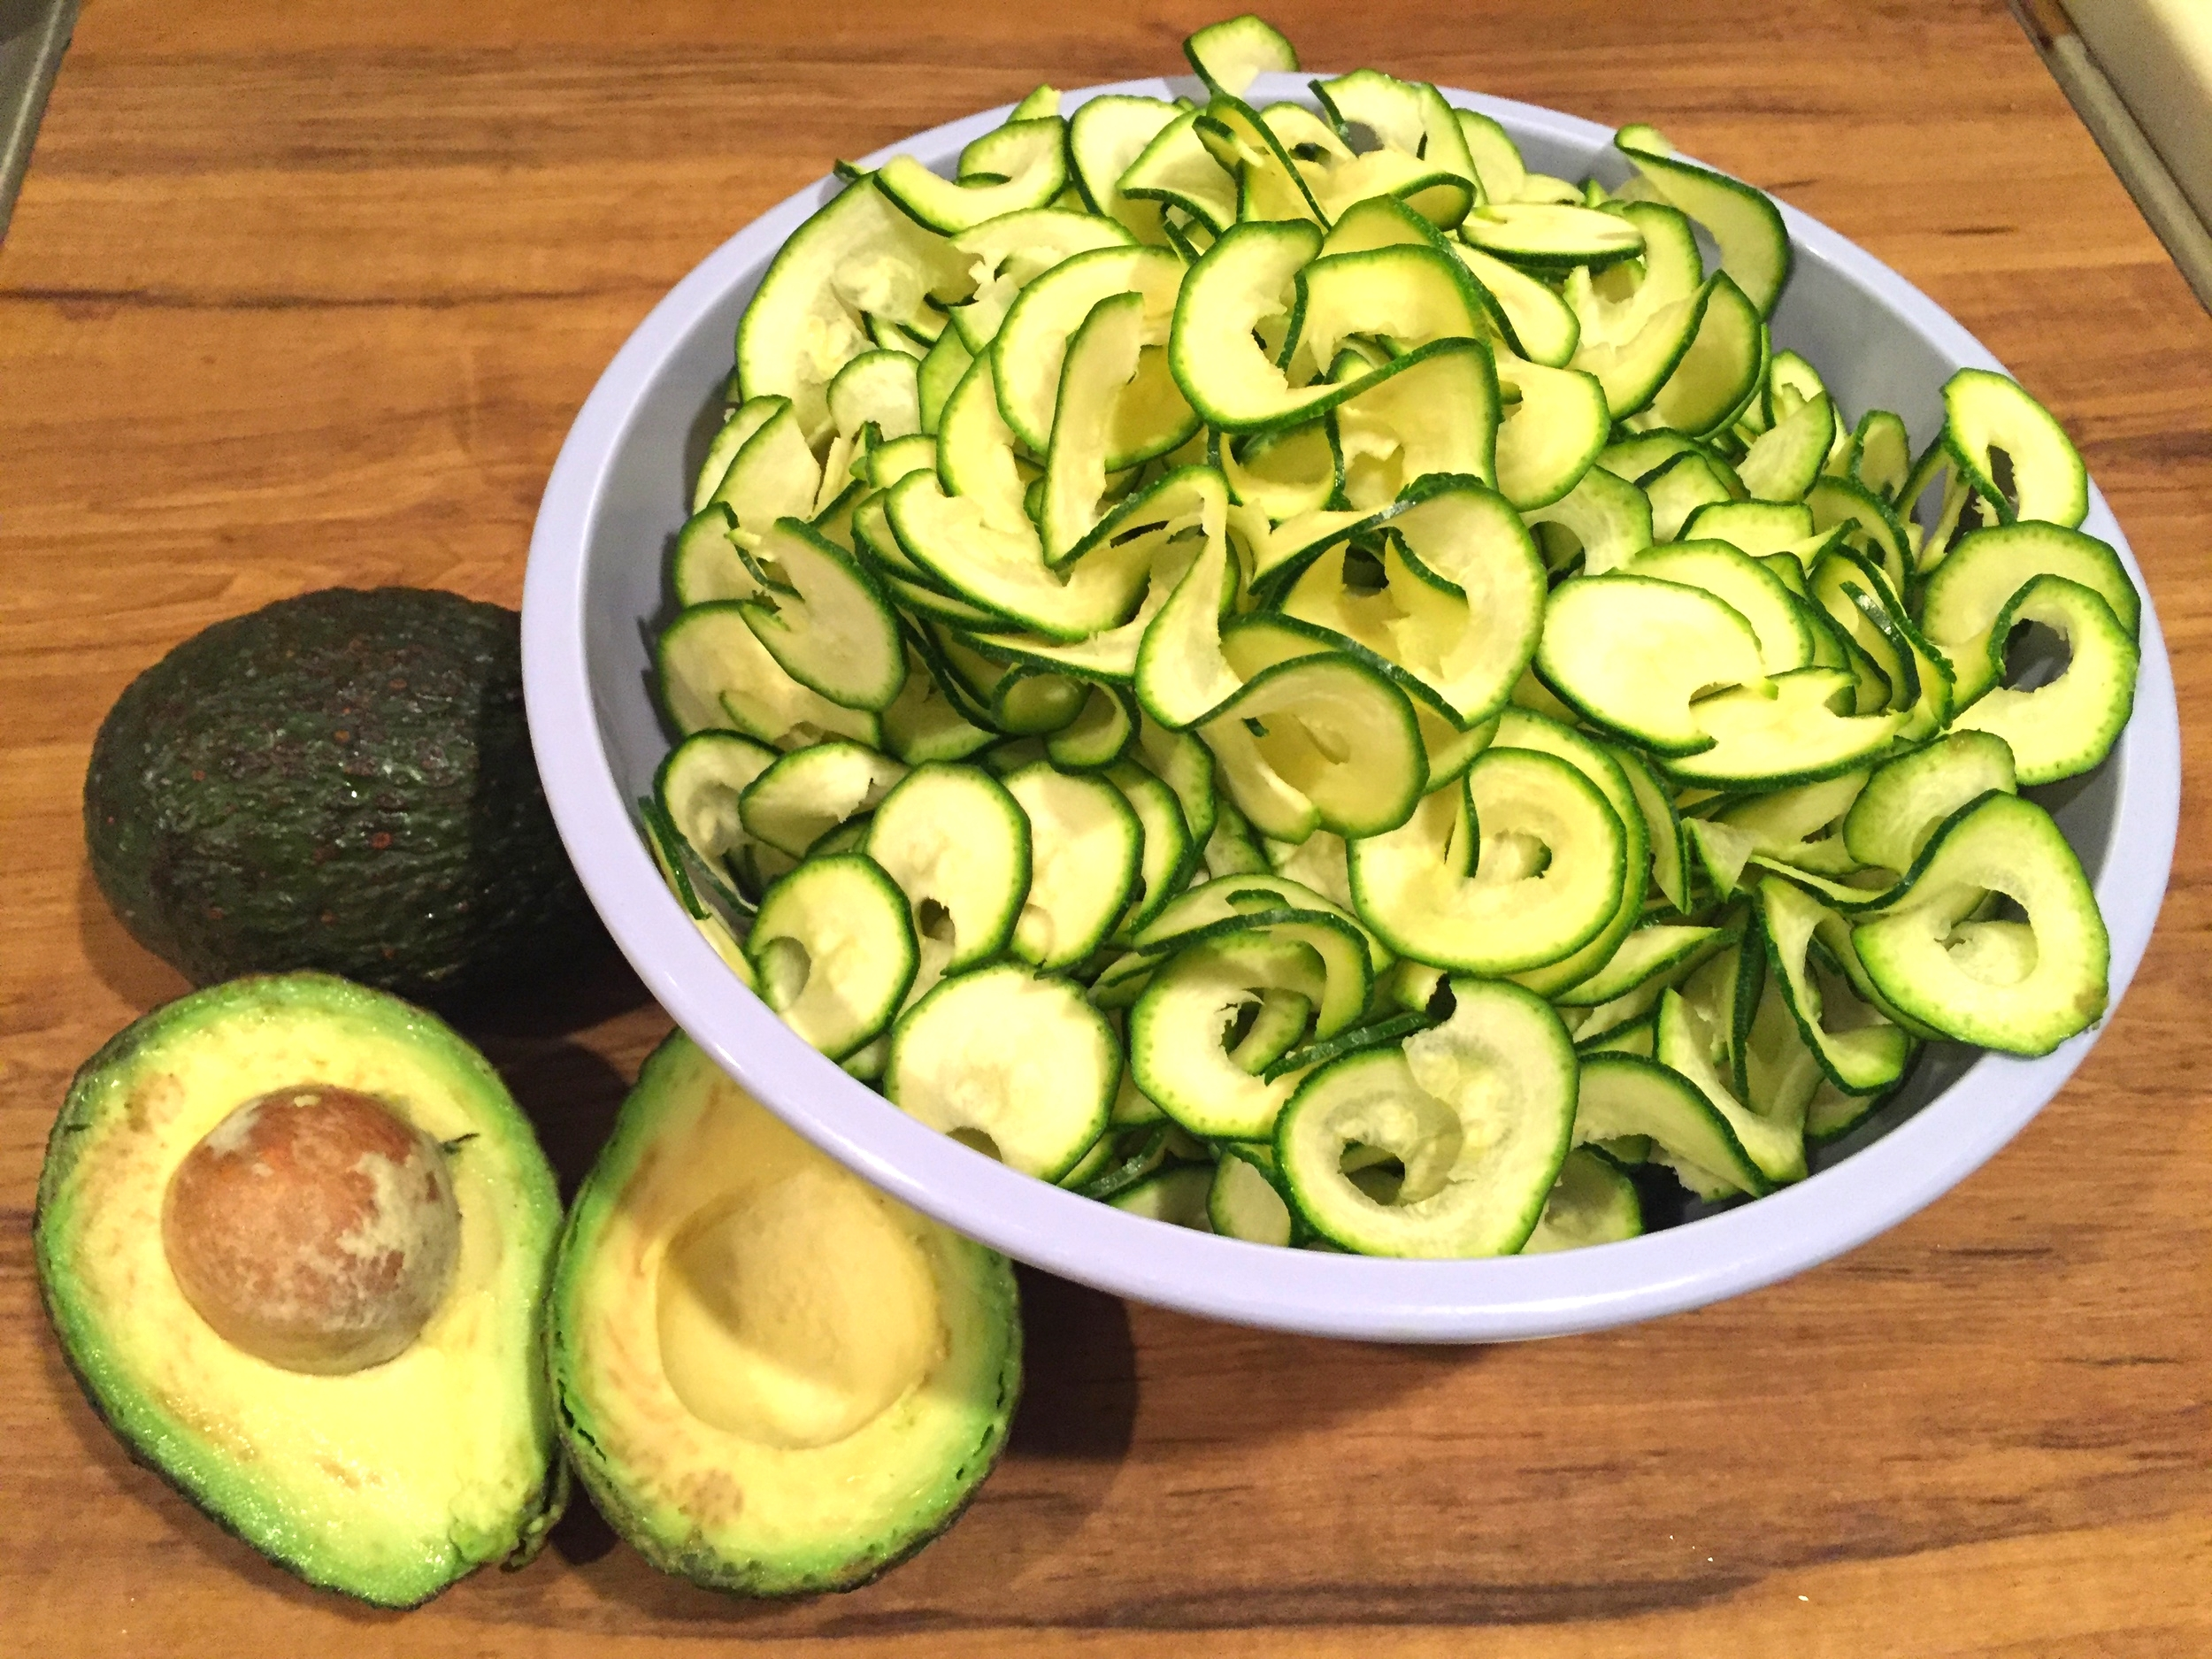 Avocado and Spiralized Zucchini